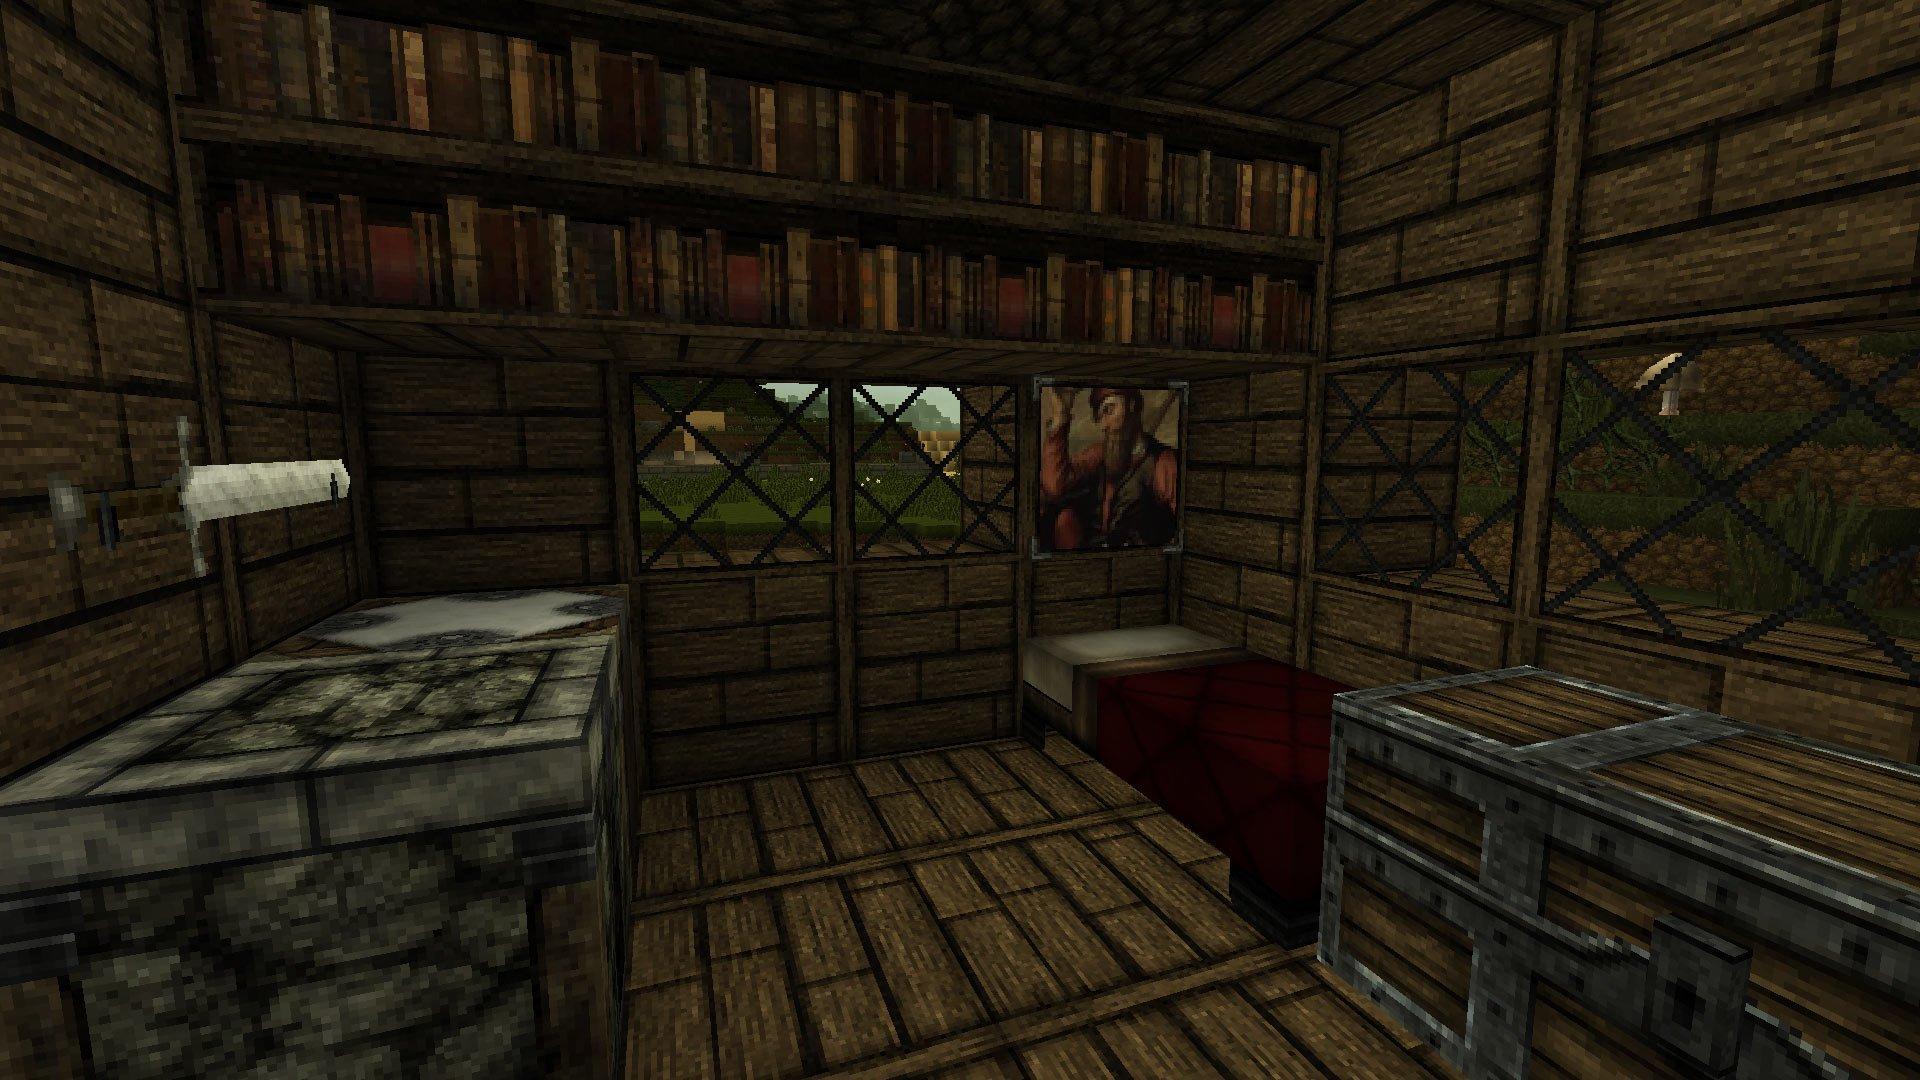 CrEaTiVeONEs Medieval ResourceTexture Pack Minecraft 18